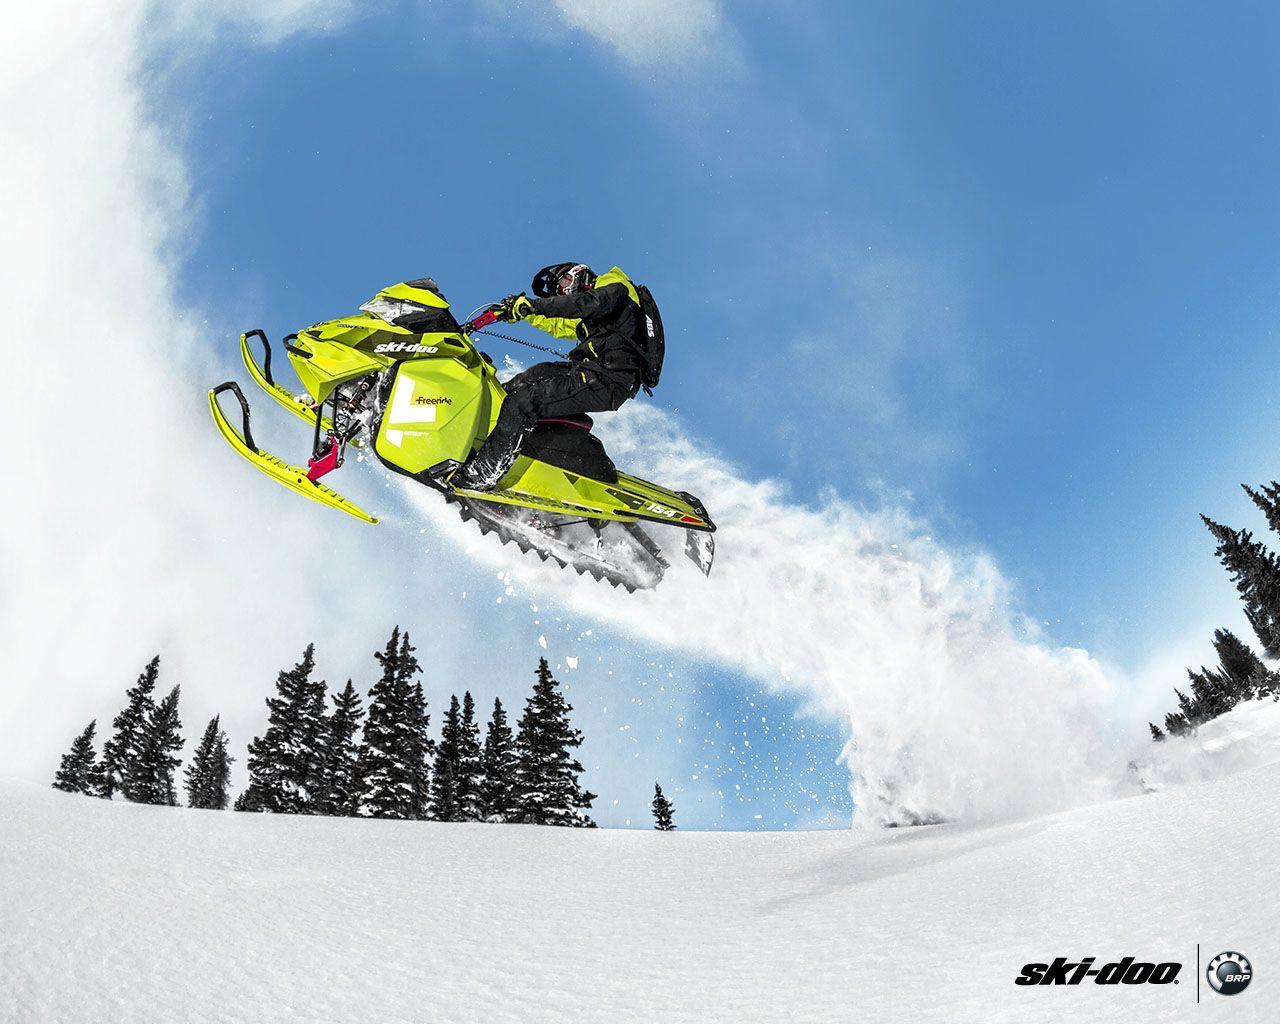 Awesome Shot Of A Ski Doo Jump